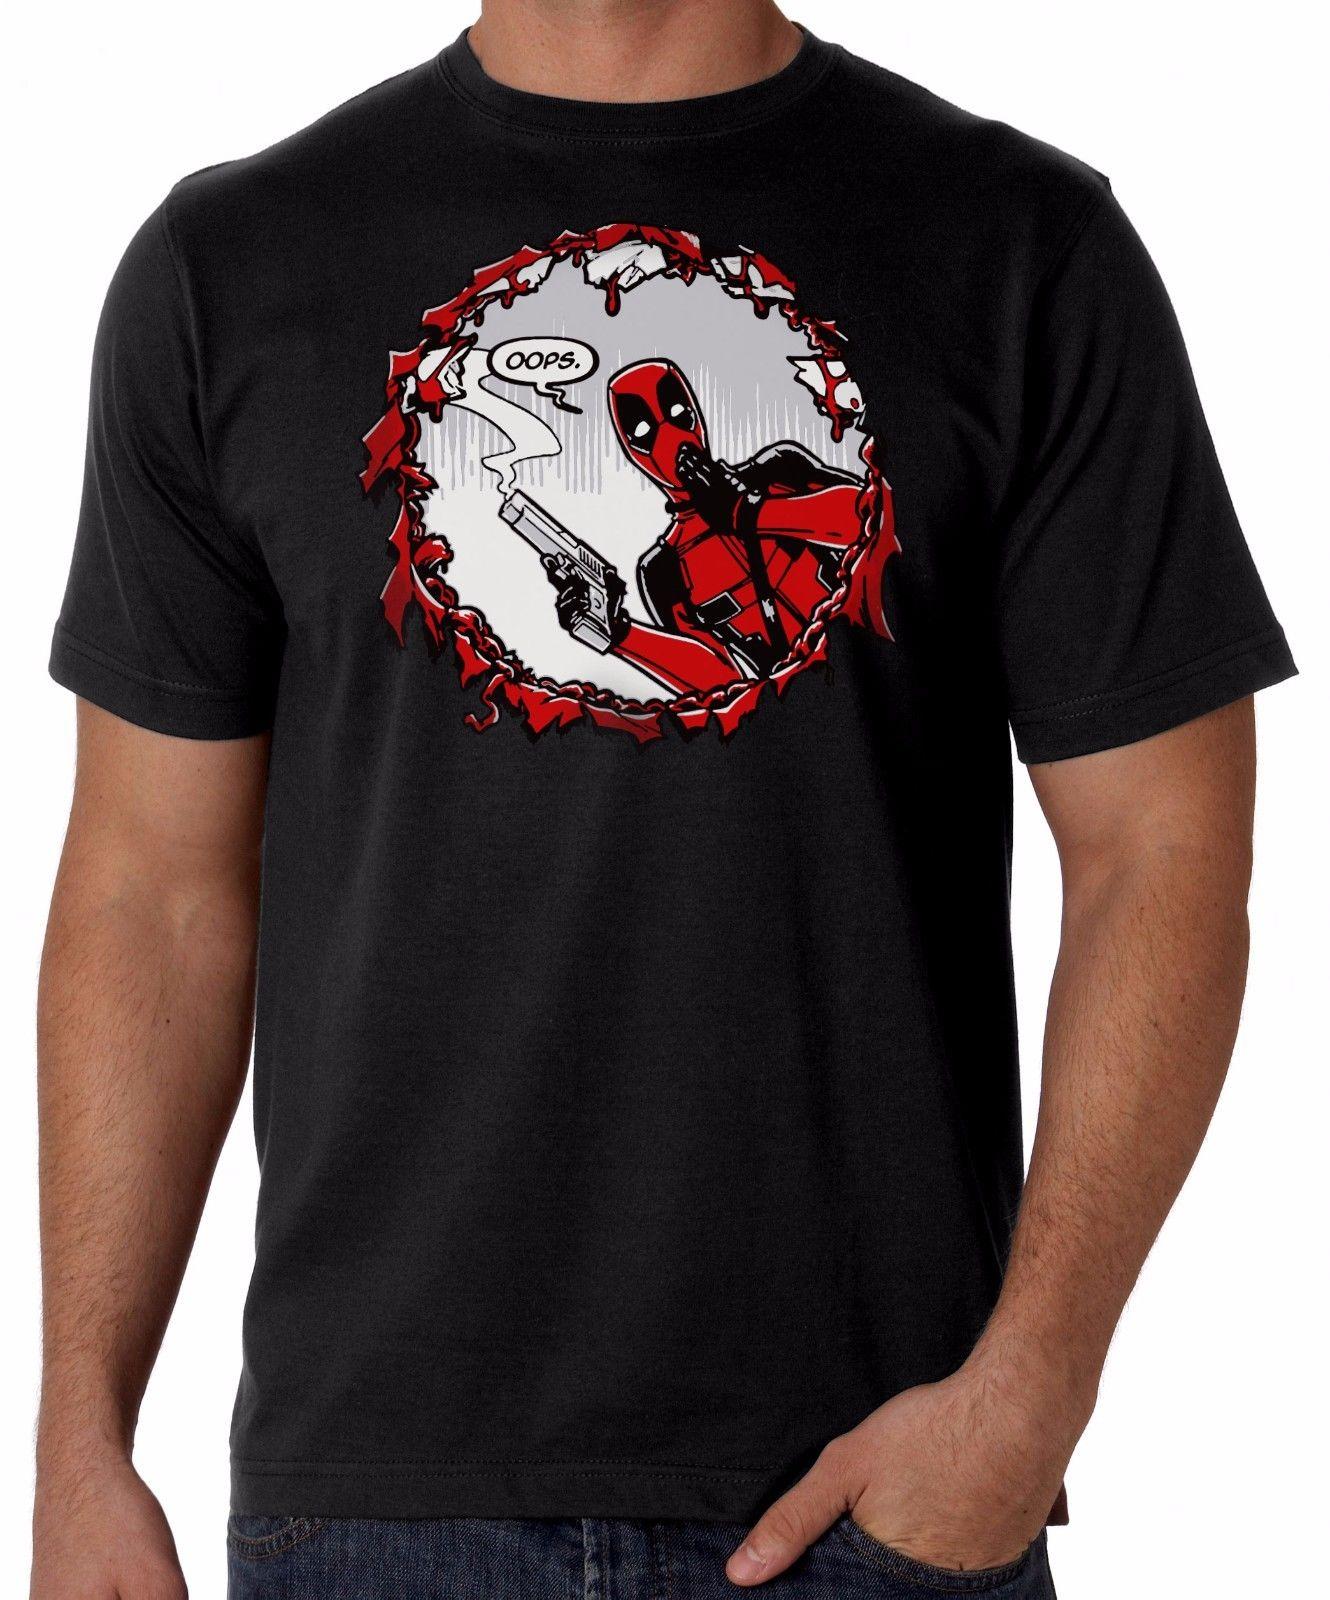 Deadpool Ooops Gun Shot T-Shirt Mens Black Comedy T-Shirt